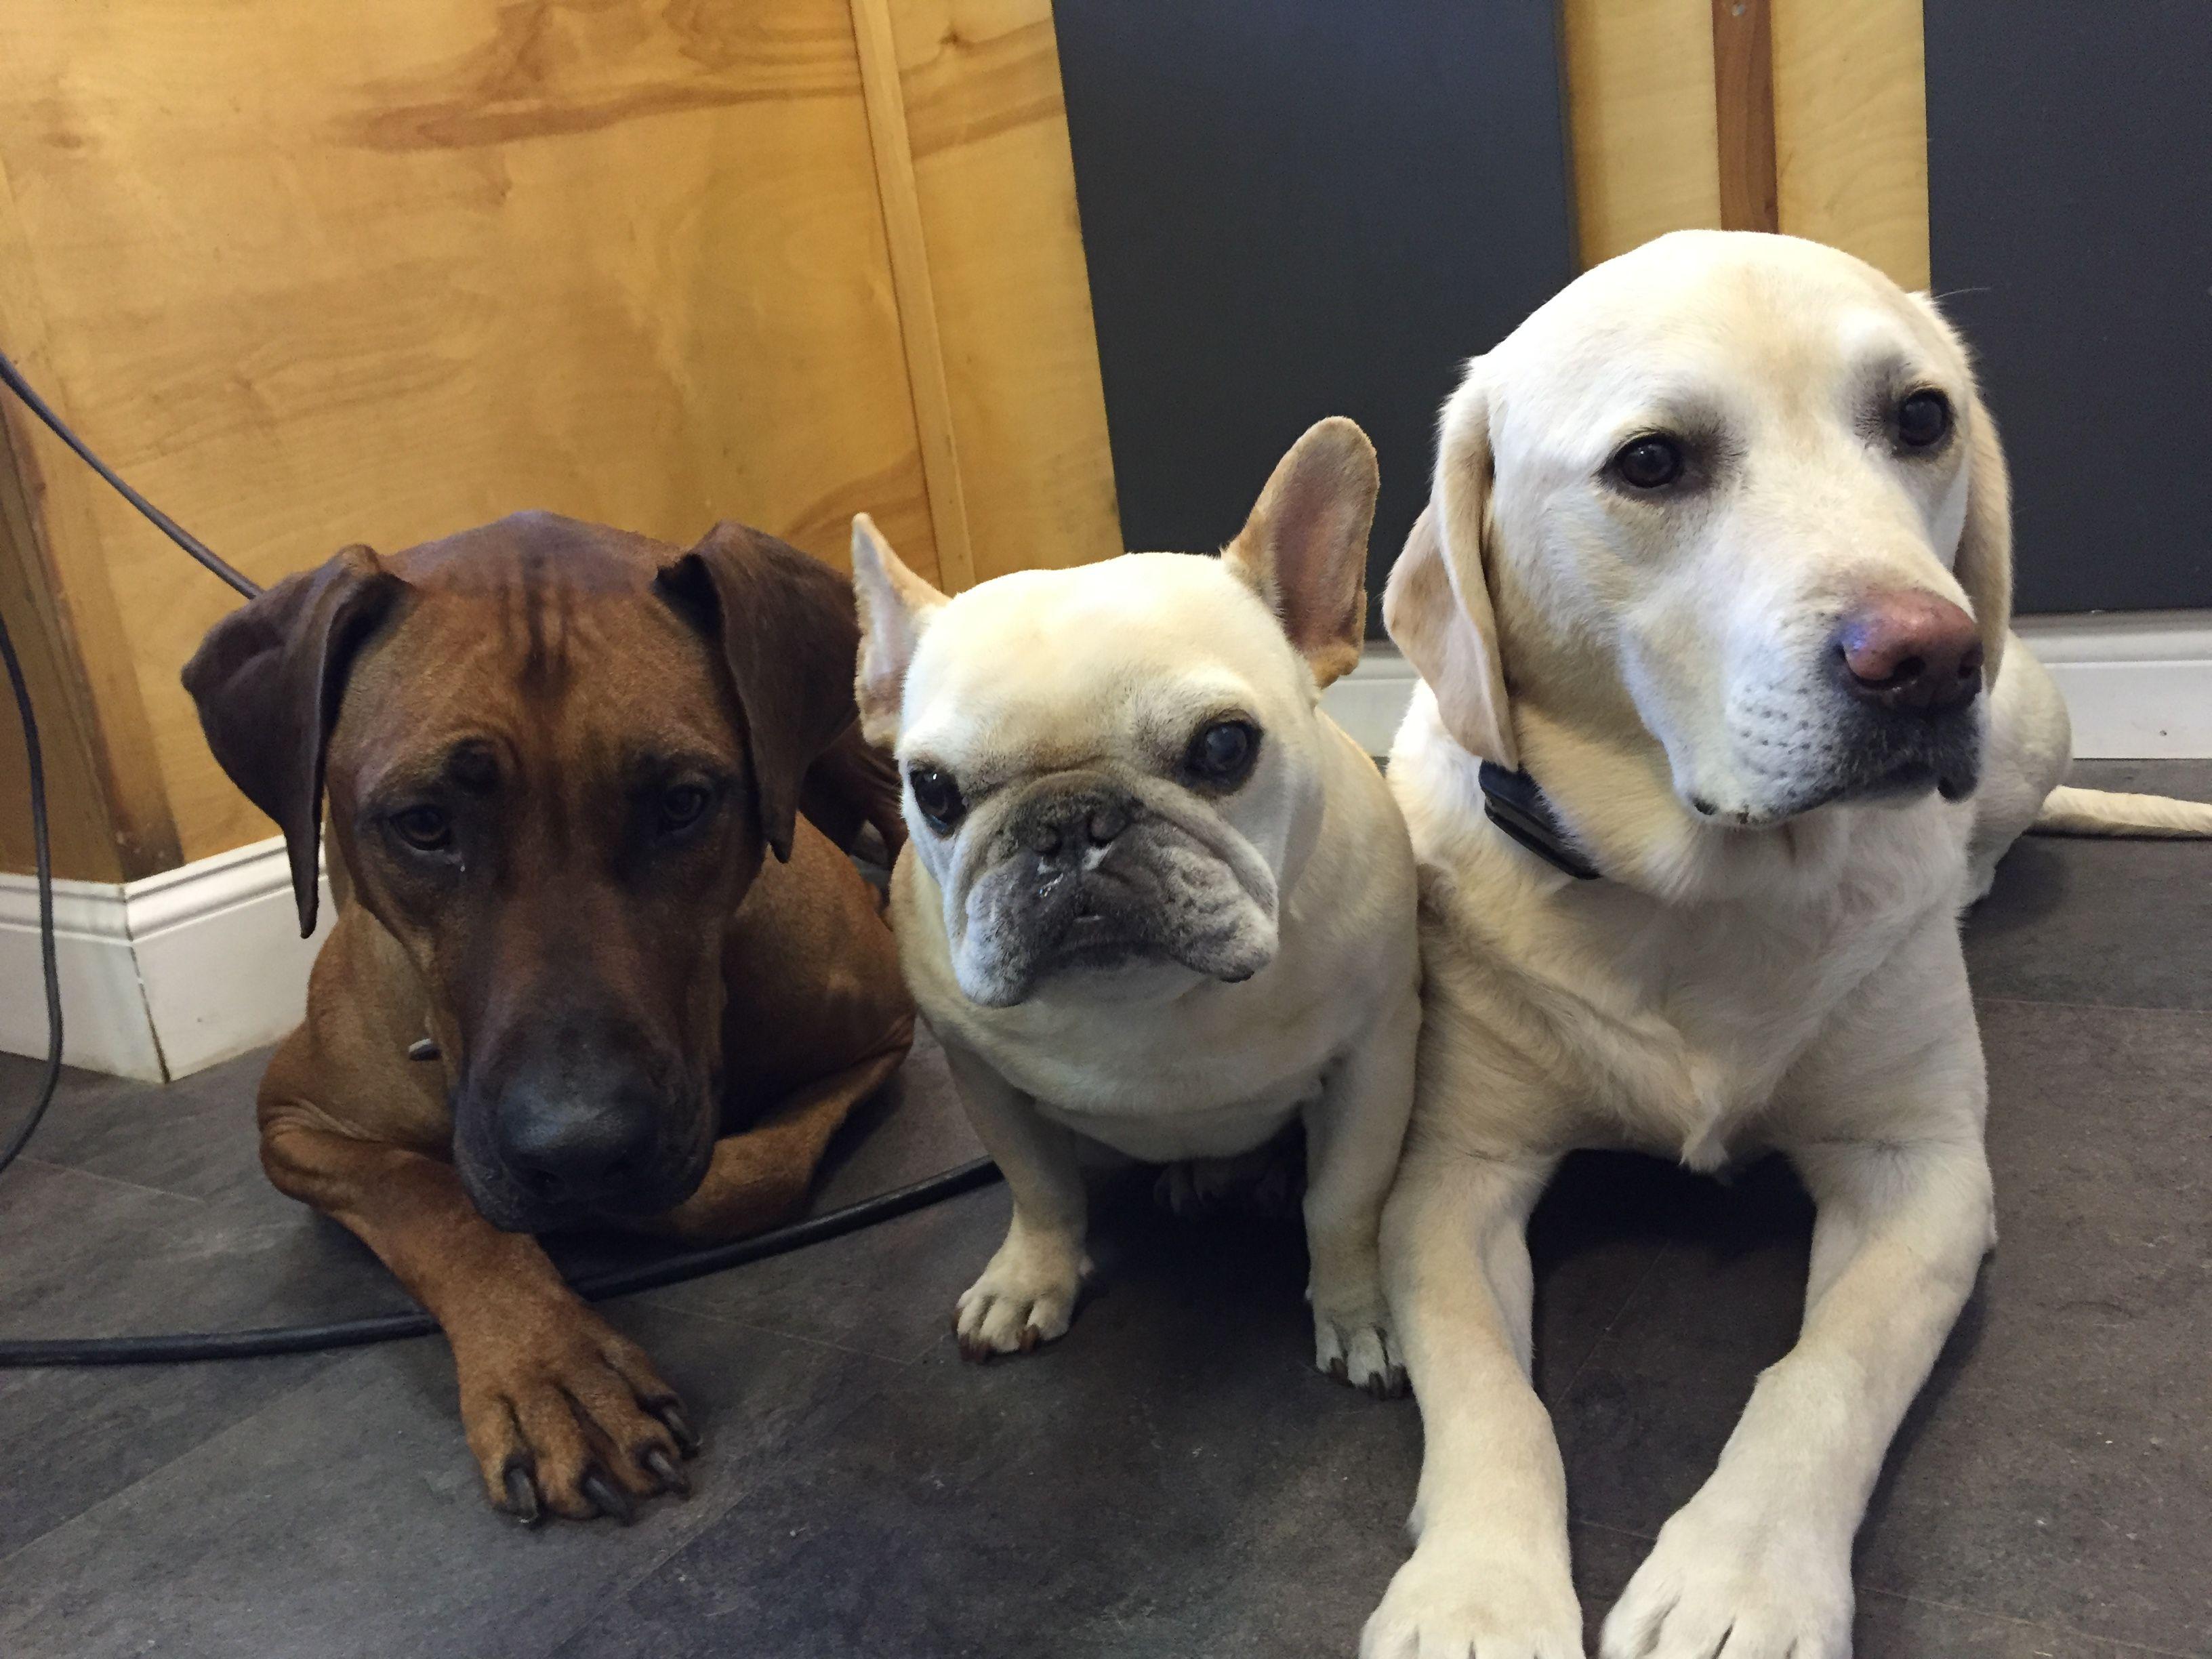 Rhodesian Ridgeback French Bulldog And Labrador Retriever In Our